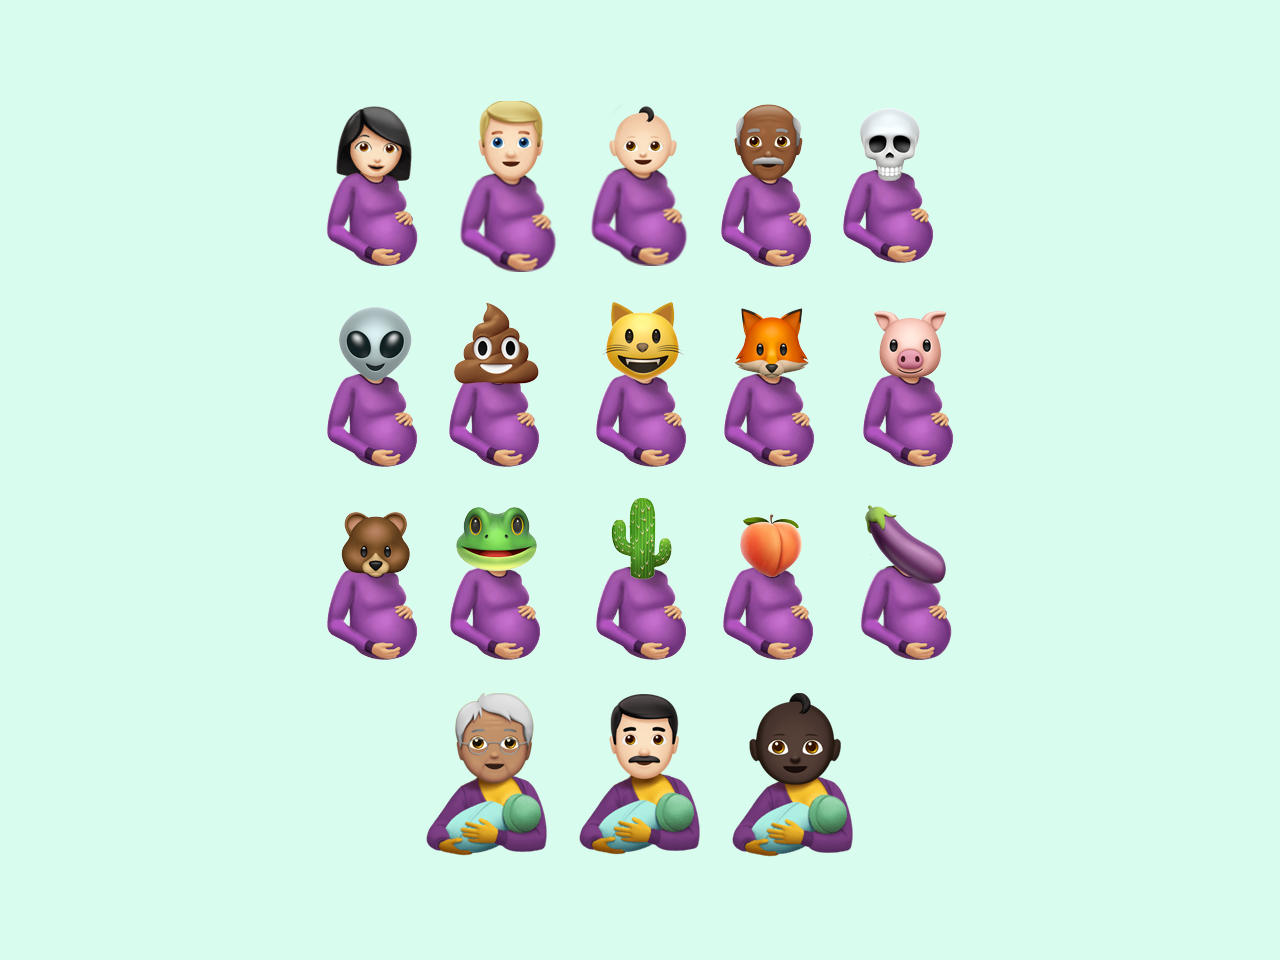 Emoji mashup that shouldn't exist pregnancy pregnant mashups emoji set mashup emojis emoji